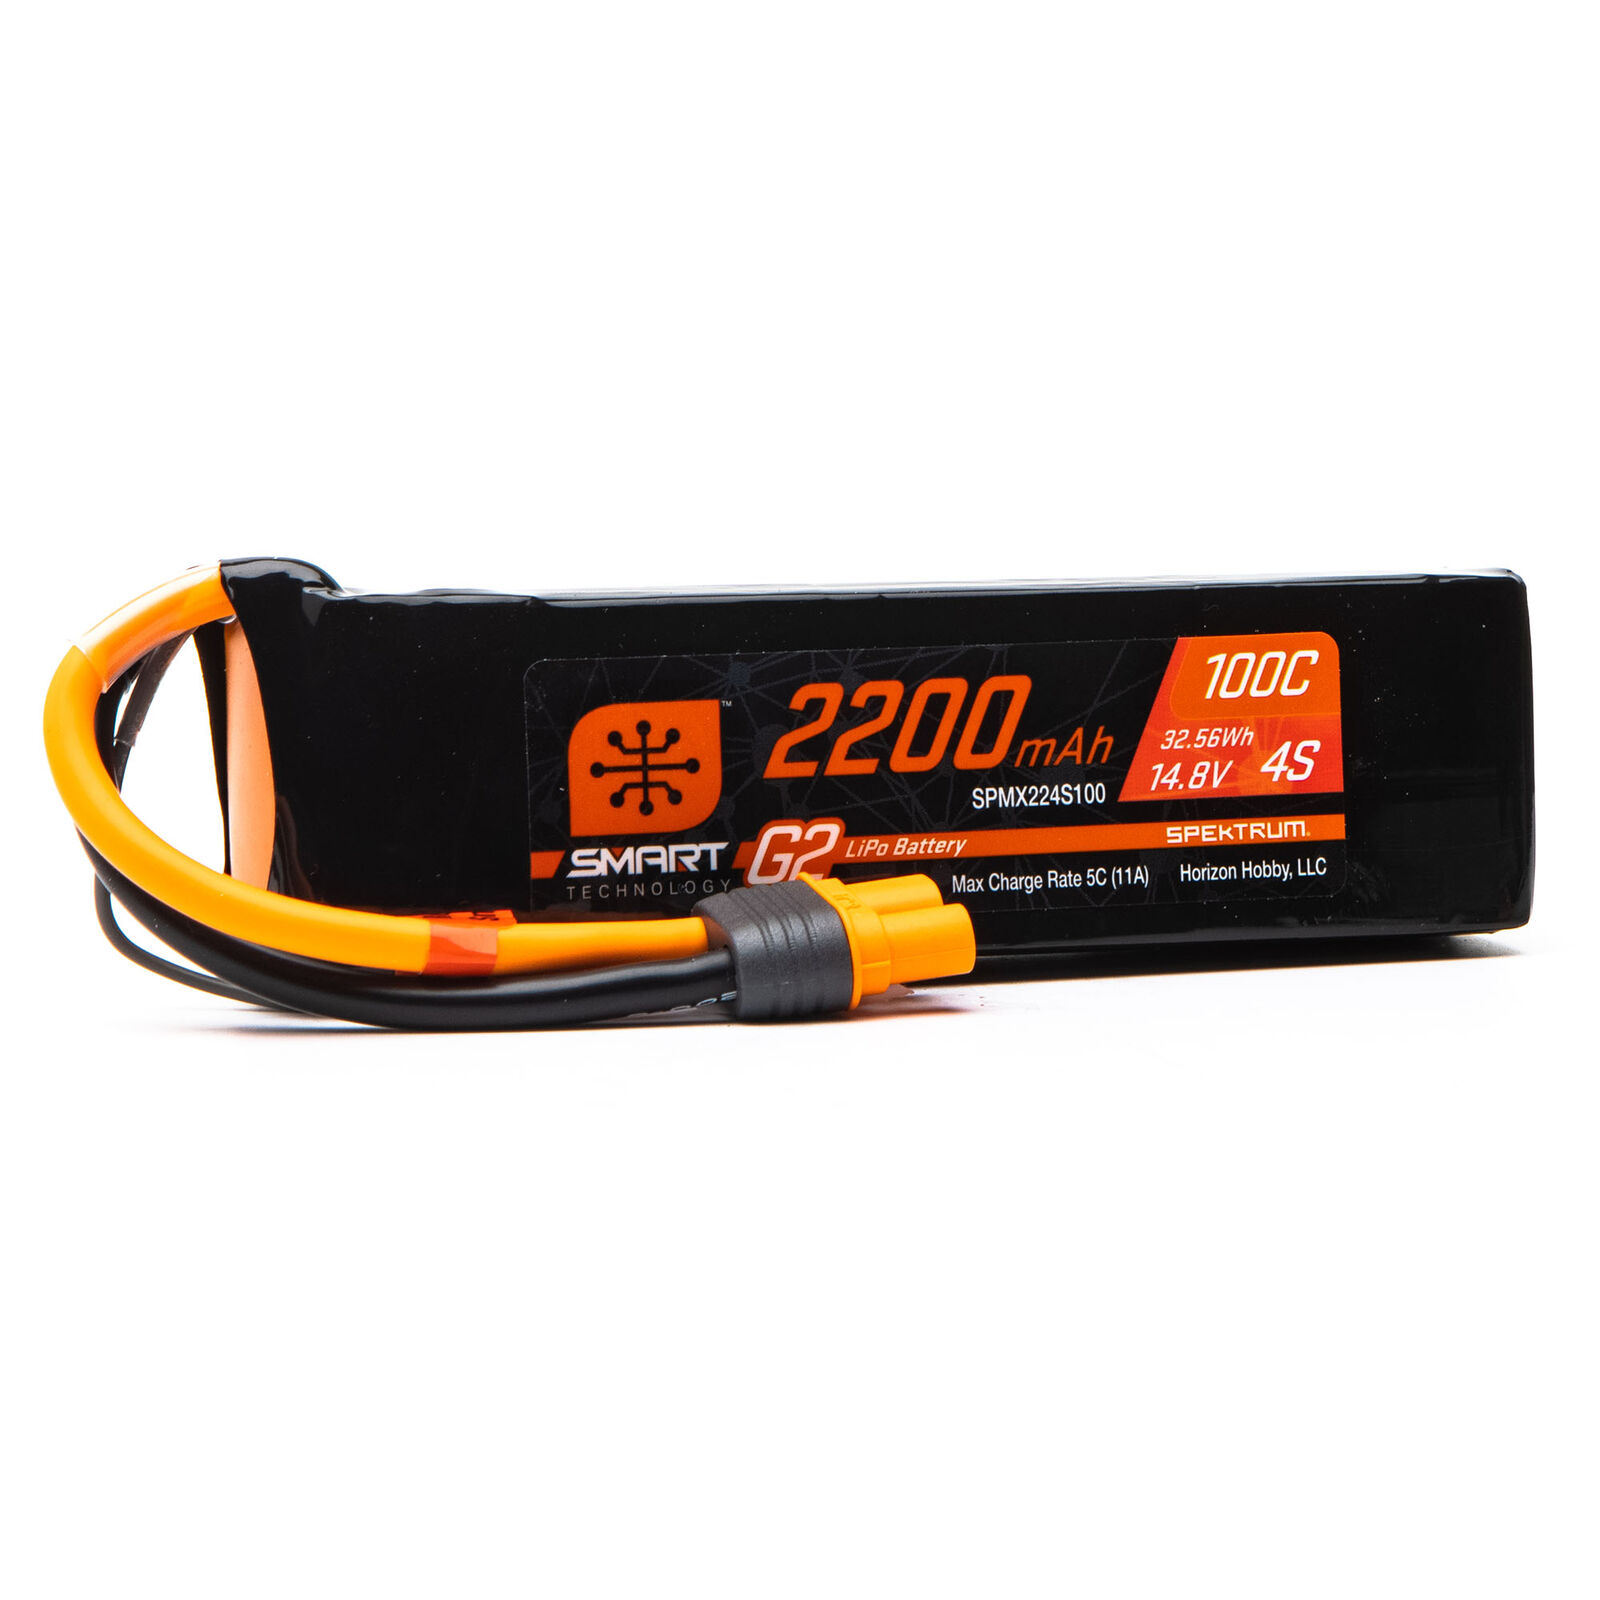 14.8V 2200mAh 4S 100C Smart G2 LiPo Battery: IC3